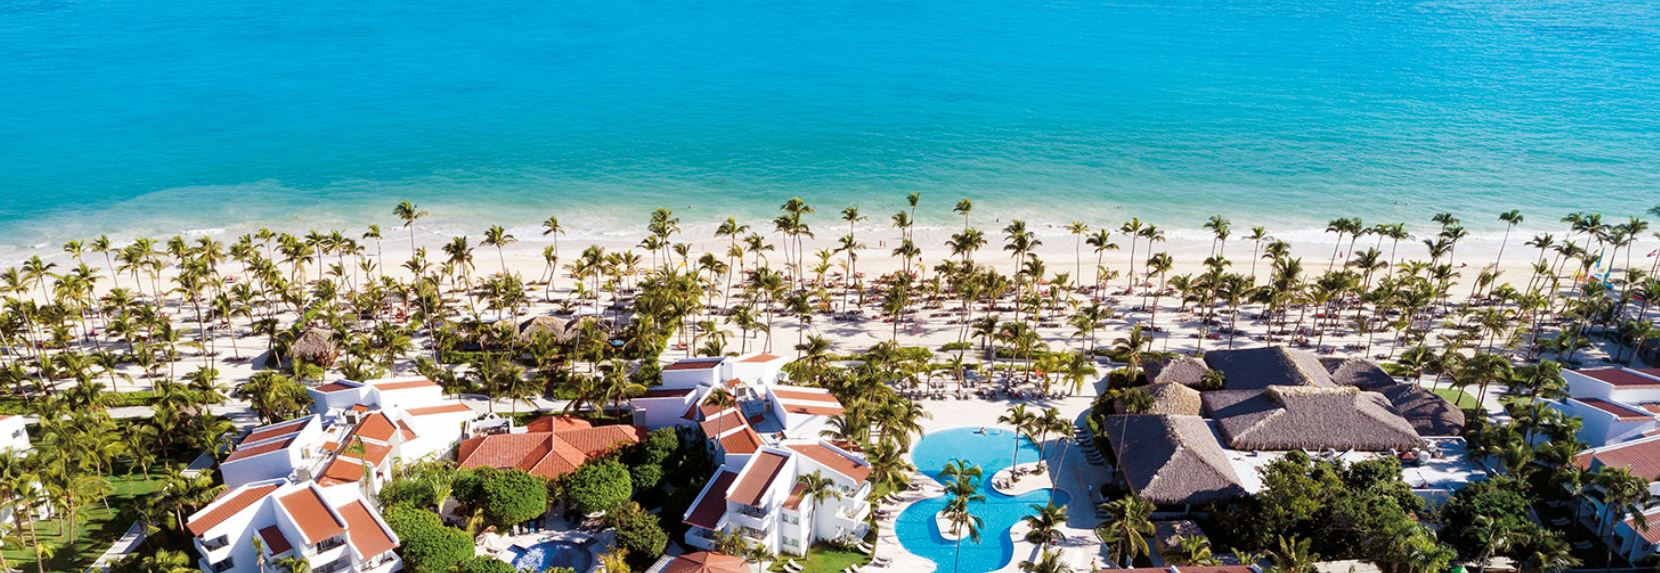 Hotel Occidental Punta Cana viajes caribe Vacaciones Sinlges